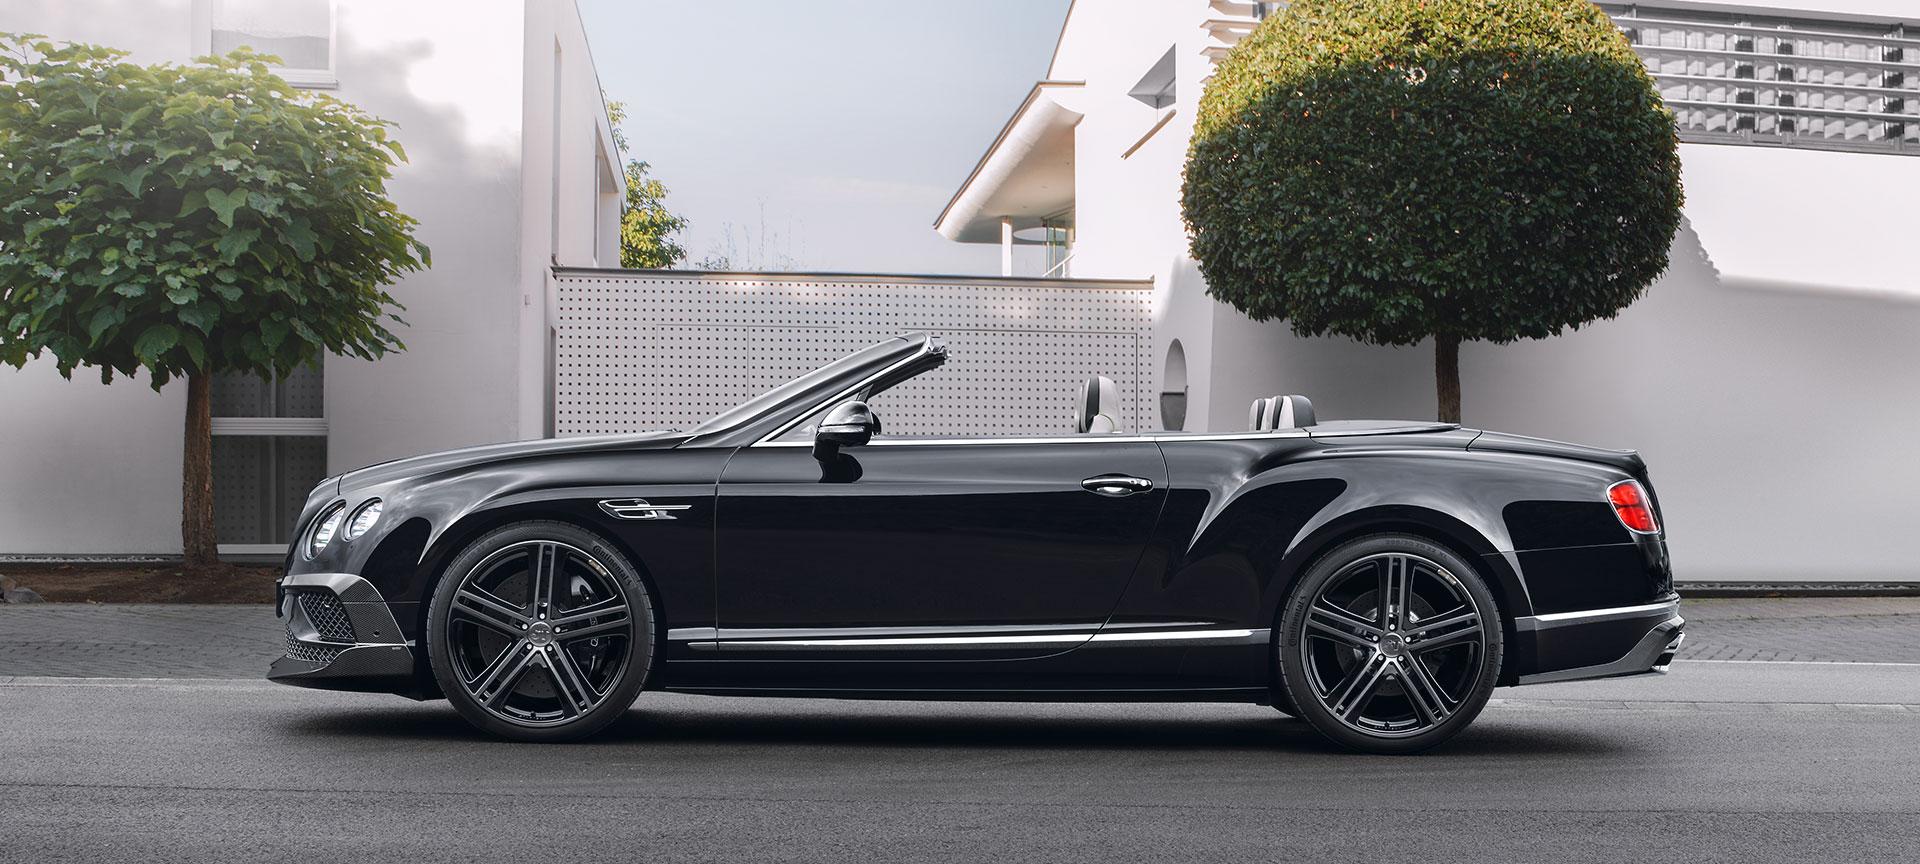 Startech Now Refines Bentley Automobiles Startech Refinement